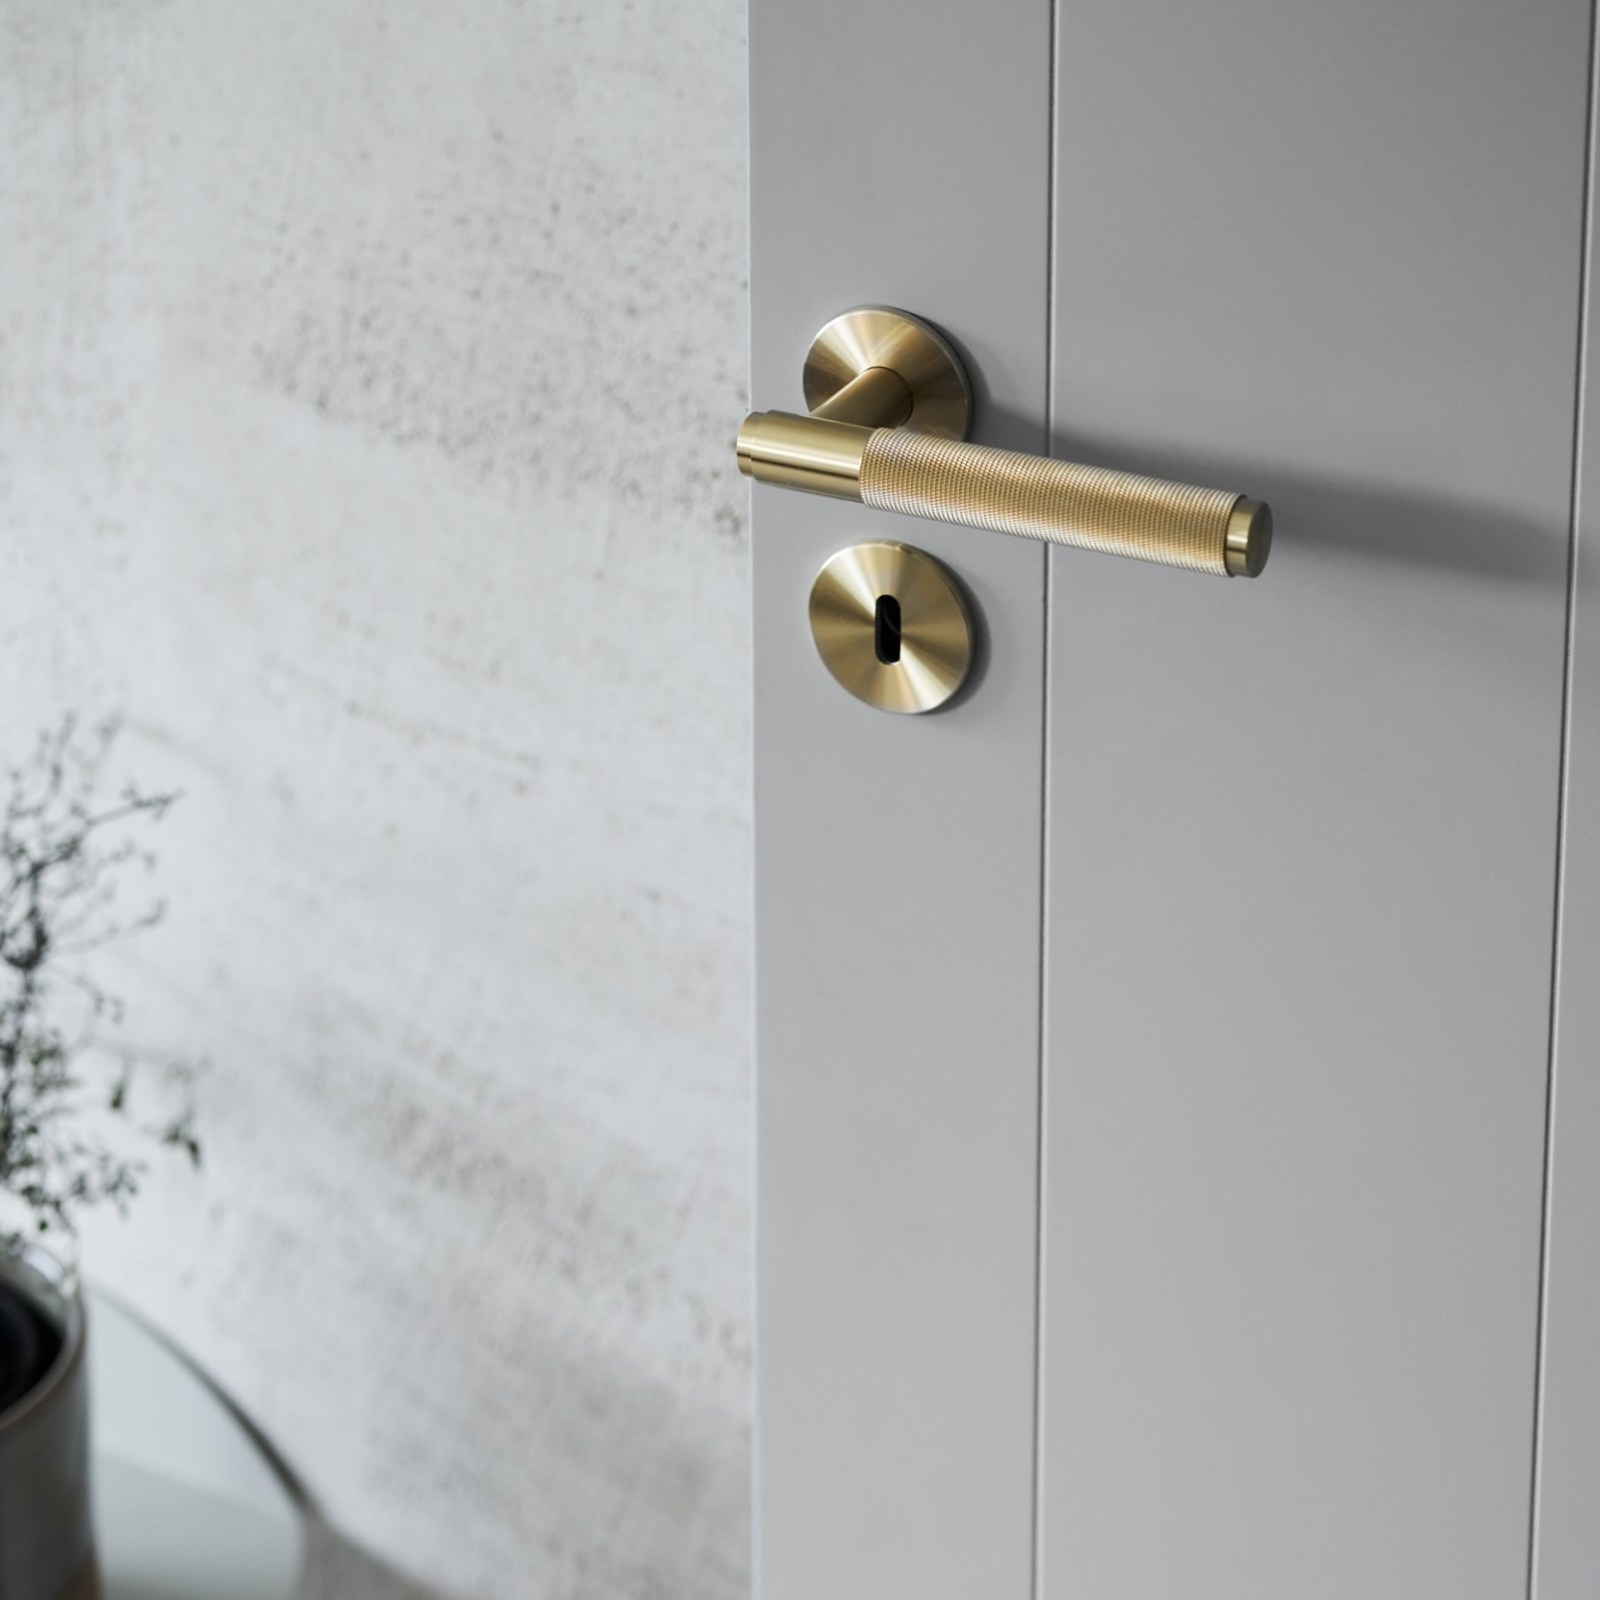 innerdörr-lines-grå-dörrhandtag-buster-punch-njord